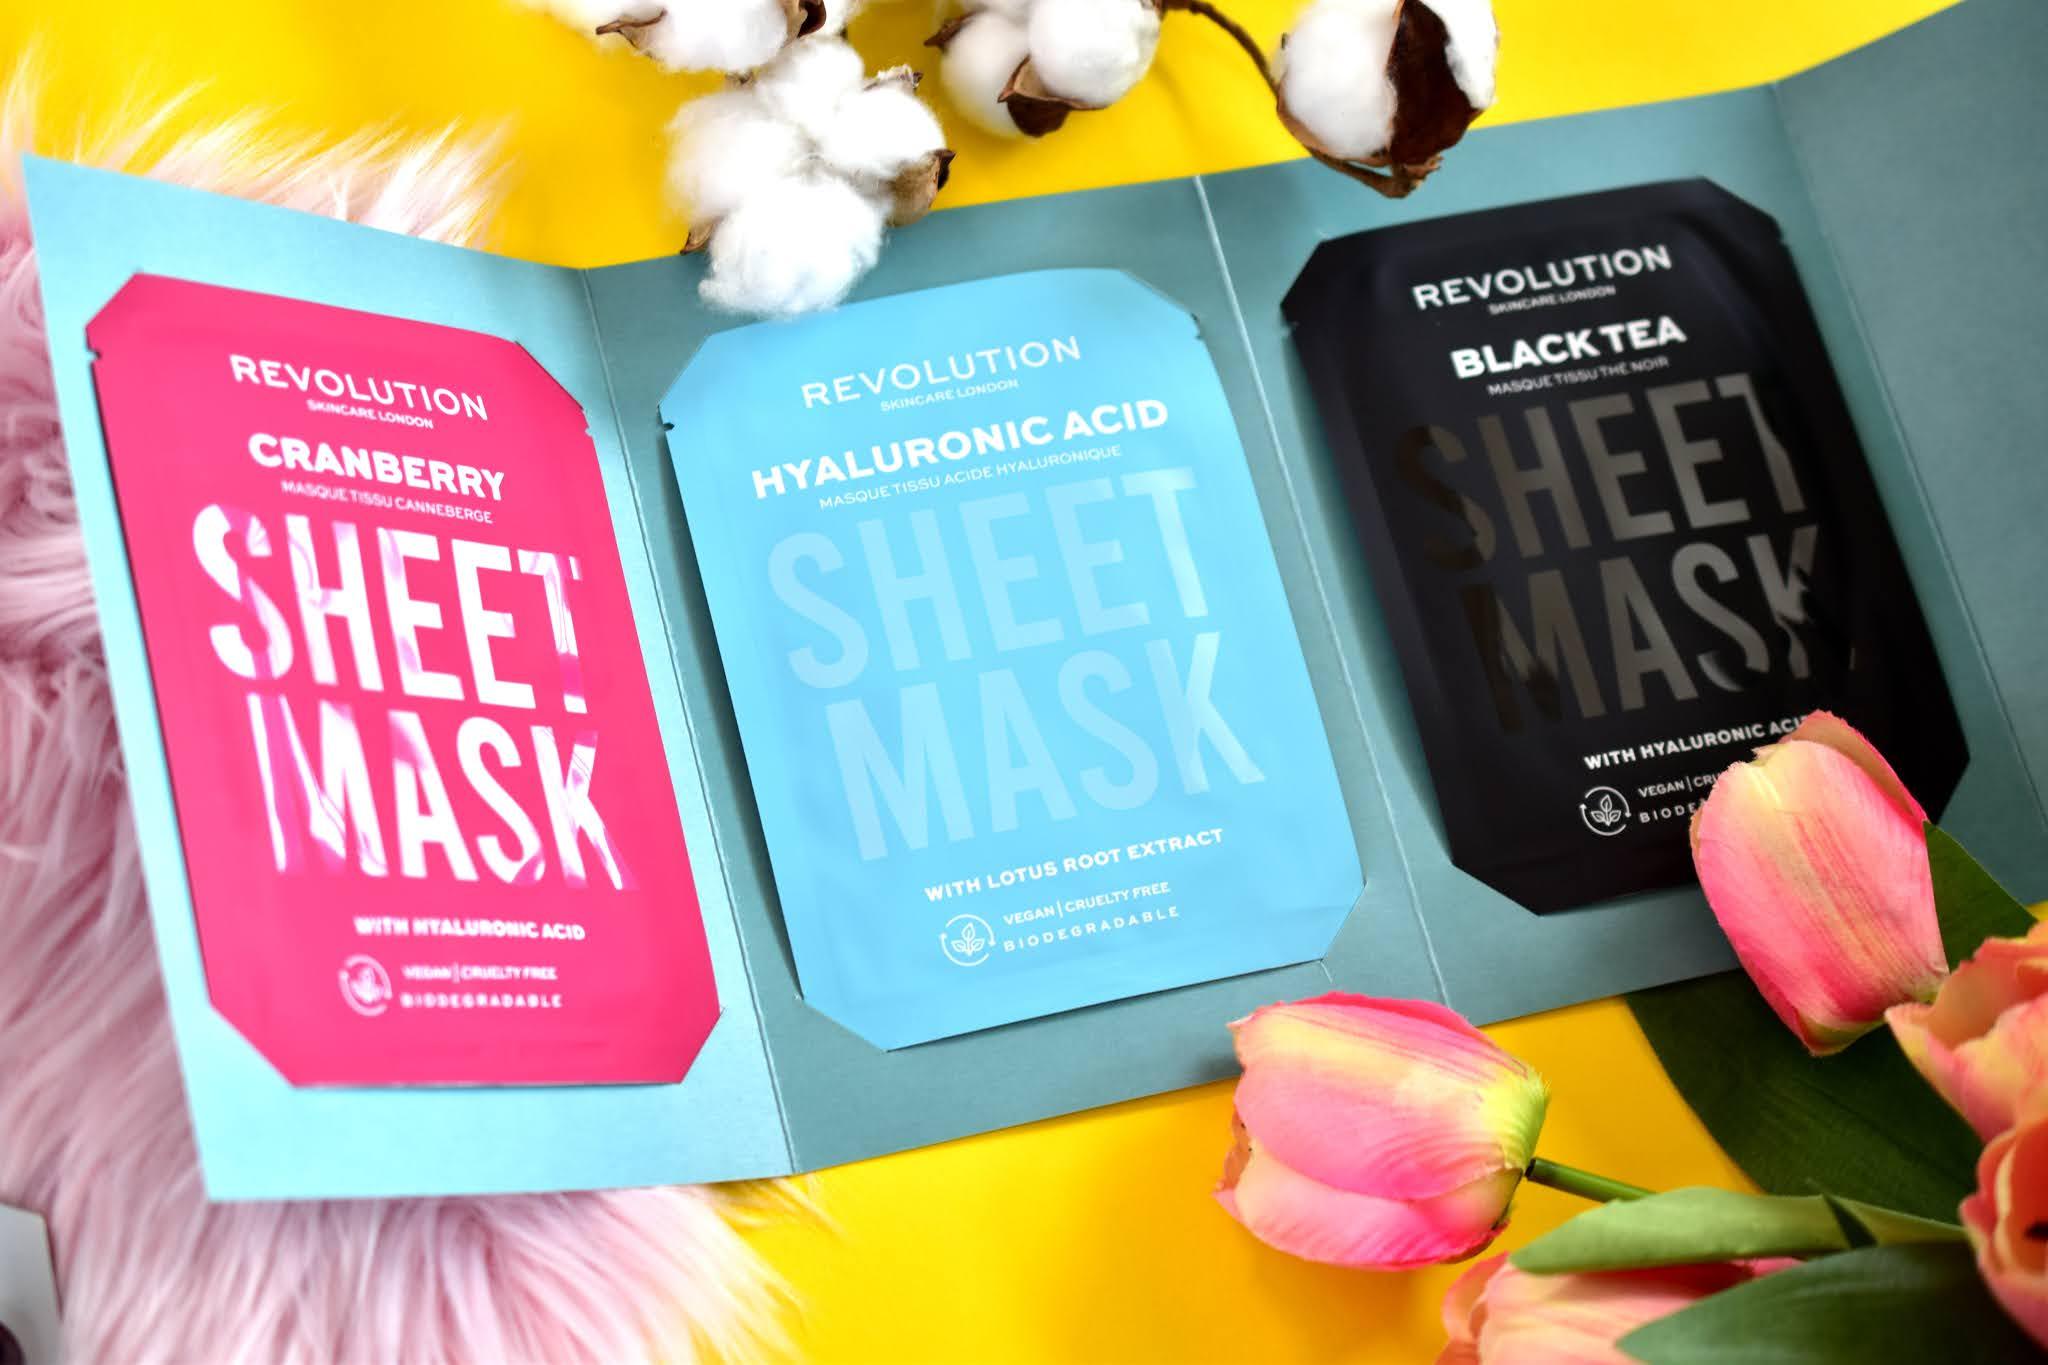 revolution skincare dehydrates skin sheet masks